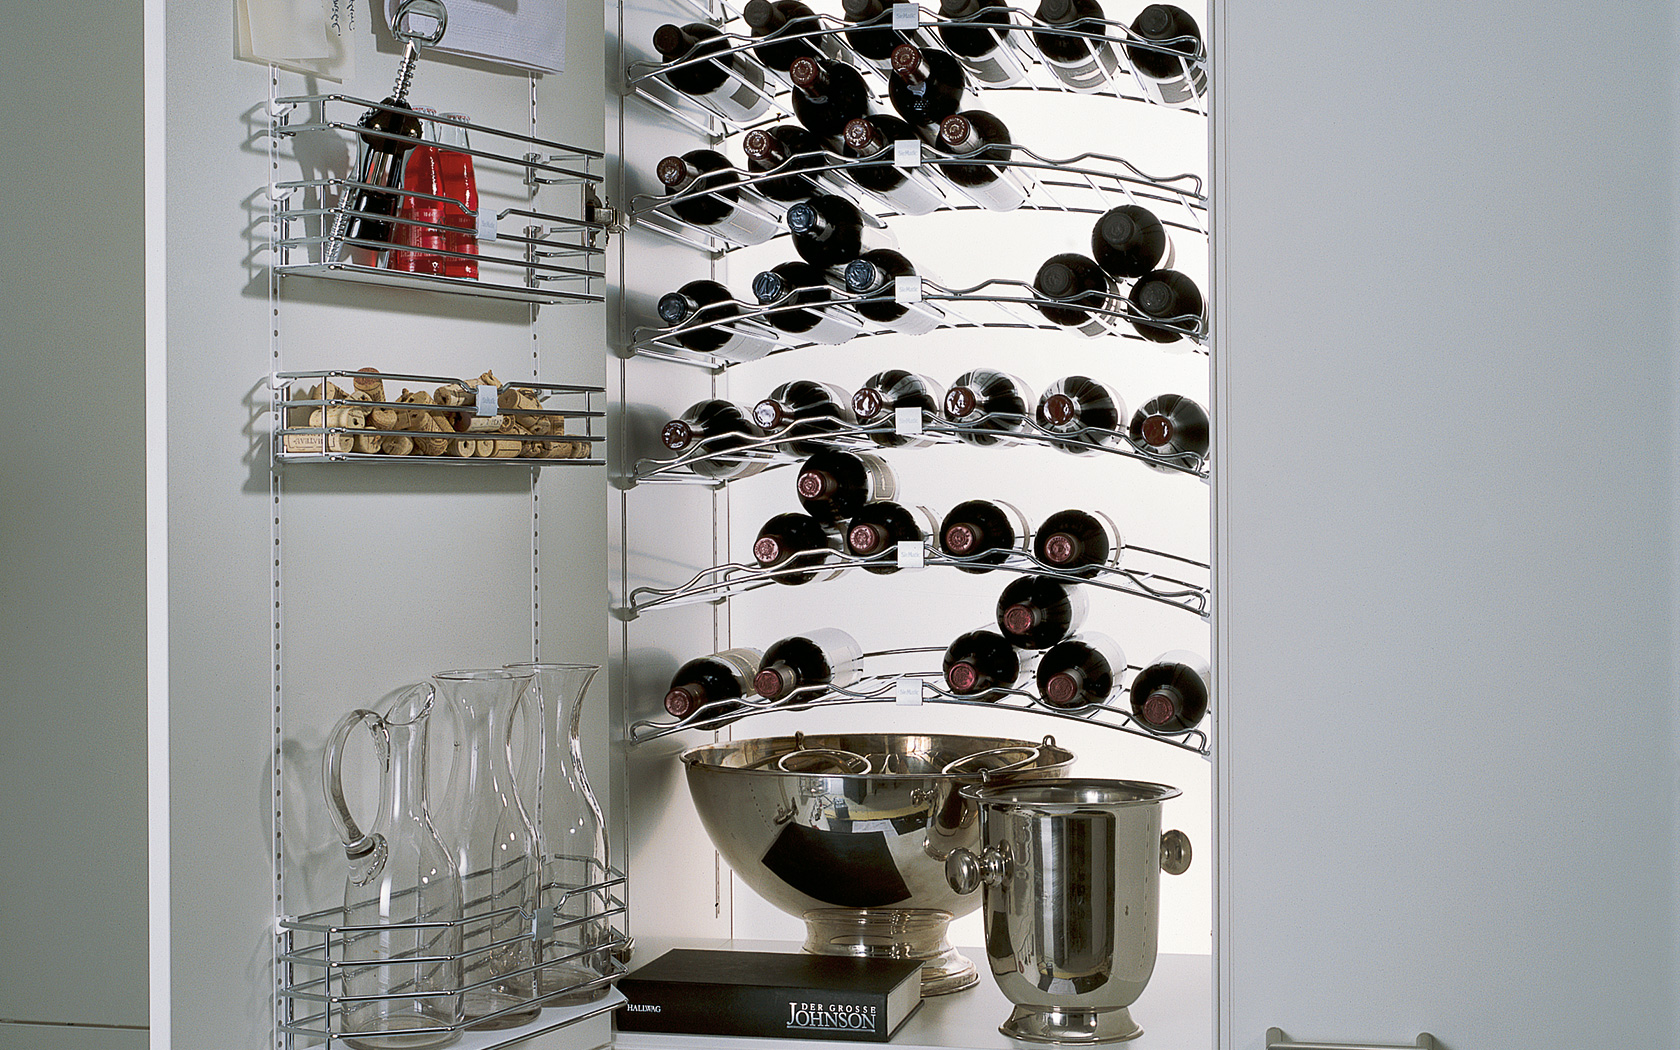 Keukenkast indeling met wijnflessen SieMatic MultiMatic